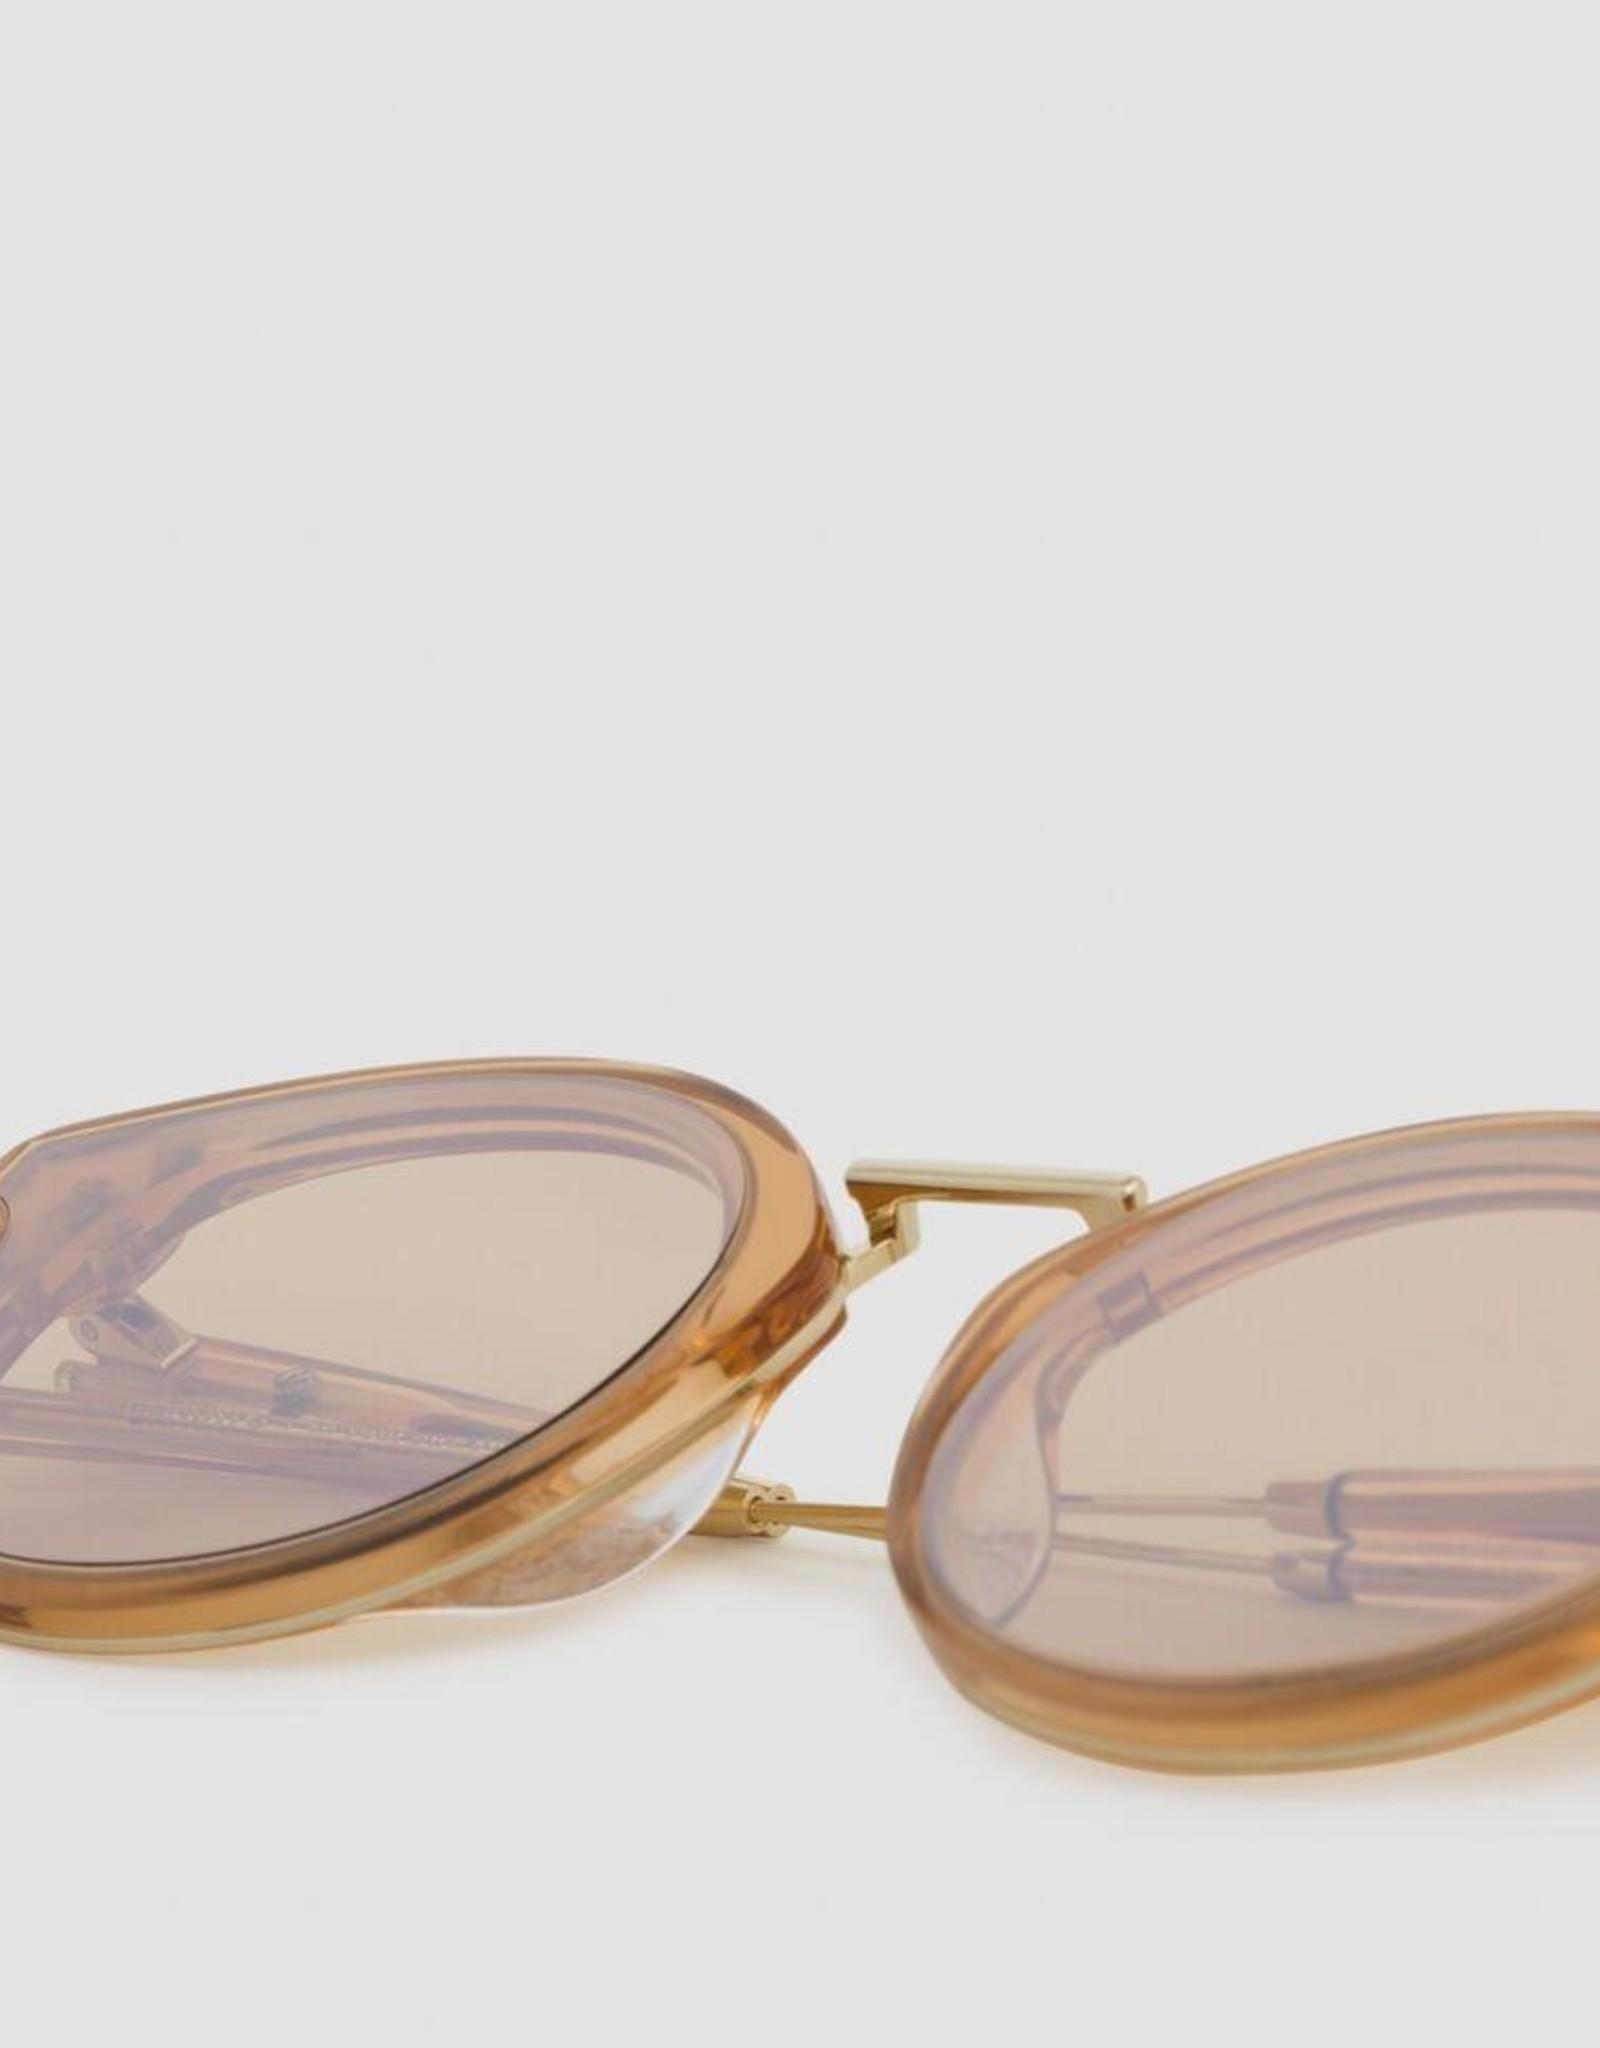 Bonnie Clyde Apricot Amber Lens Bandito